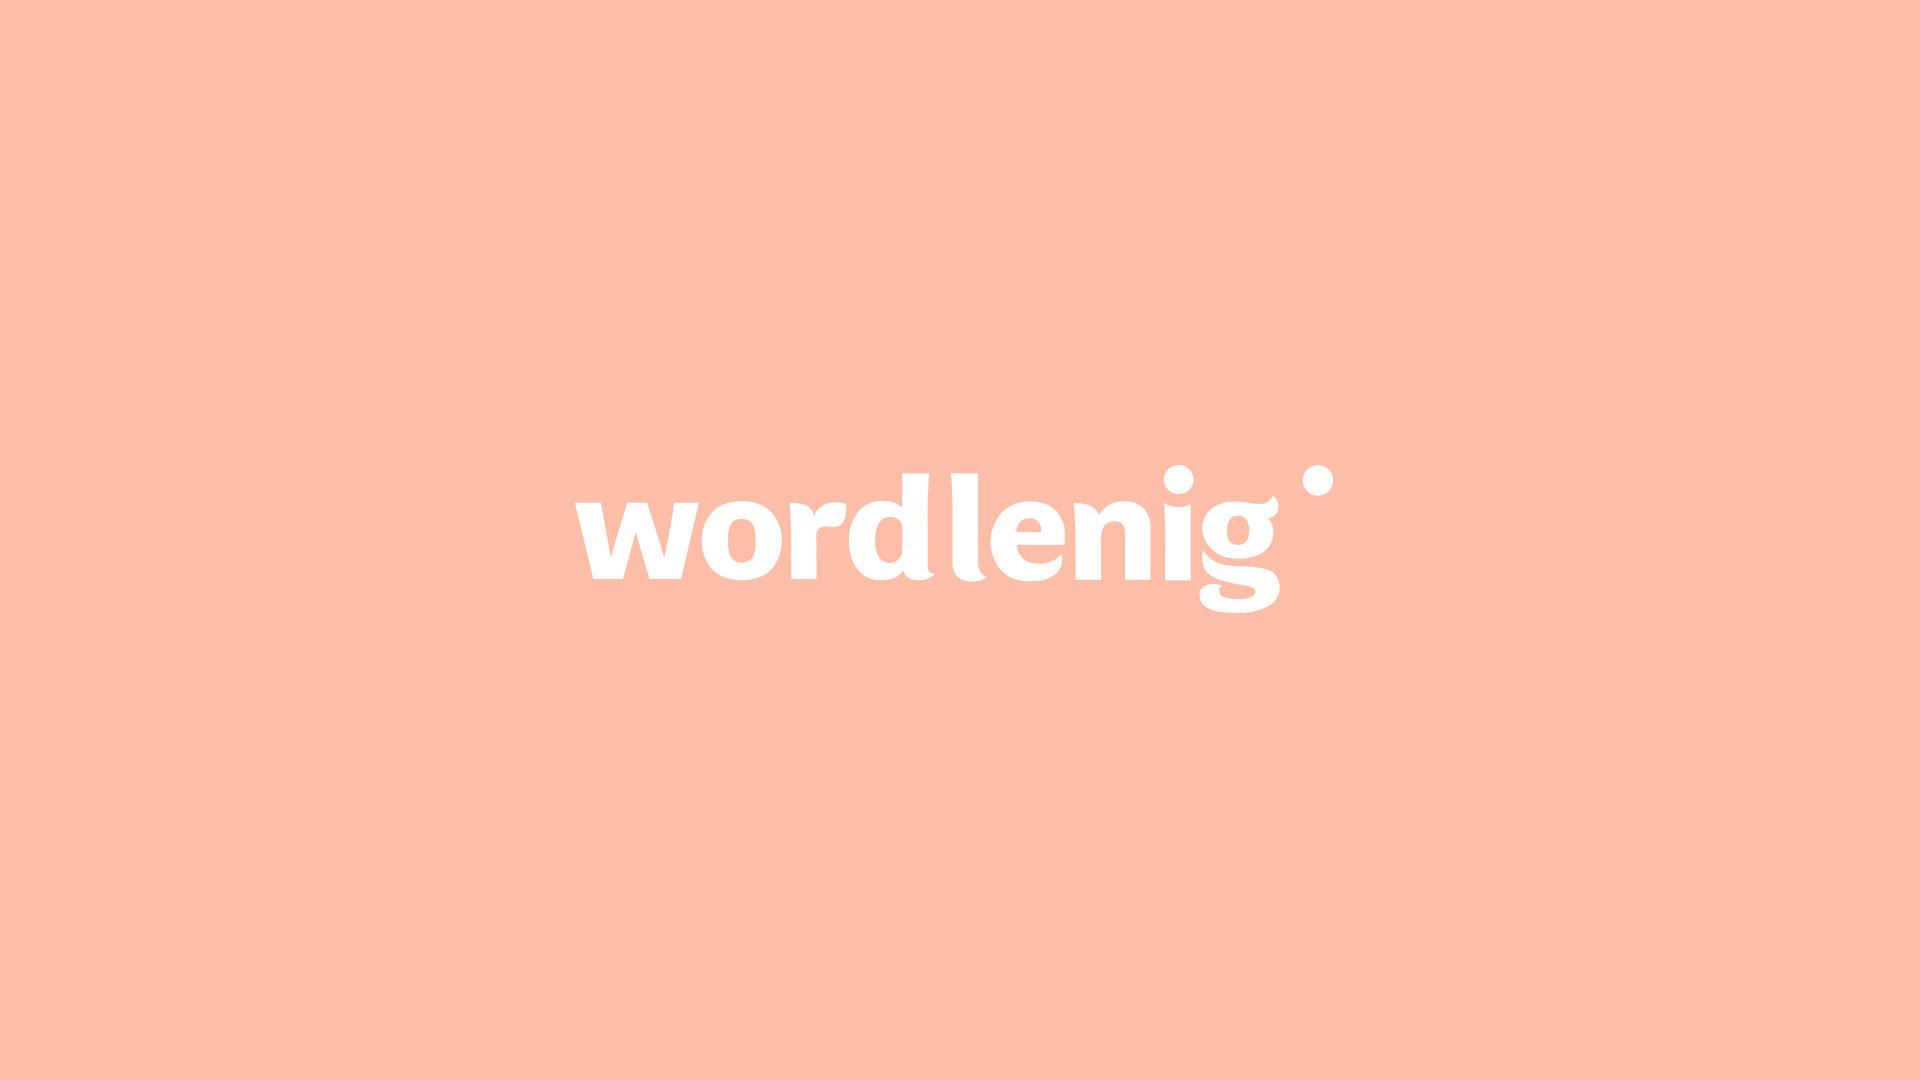 wordlenig_8.jpg